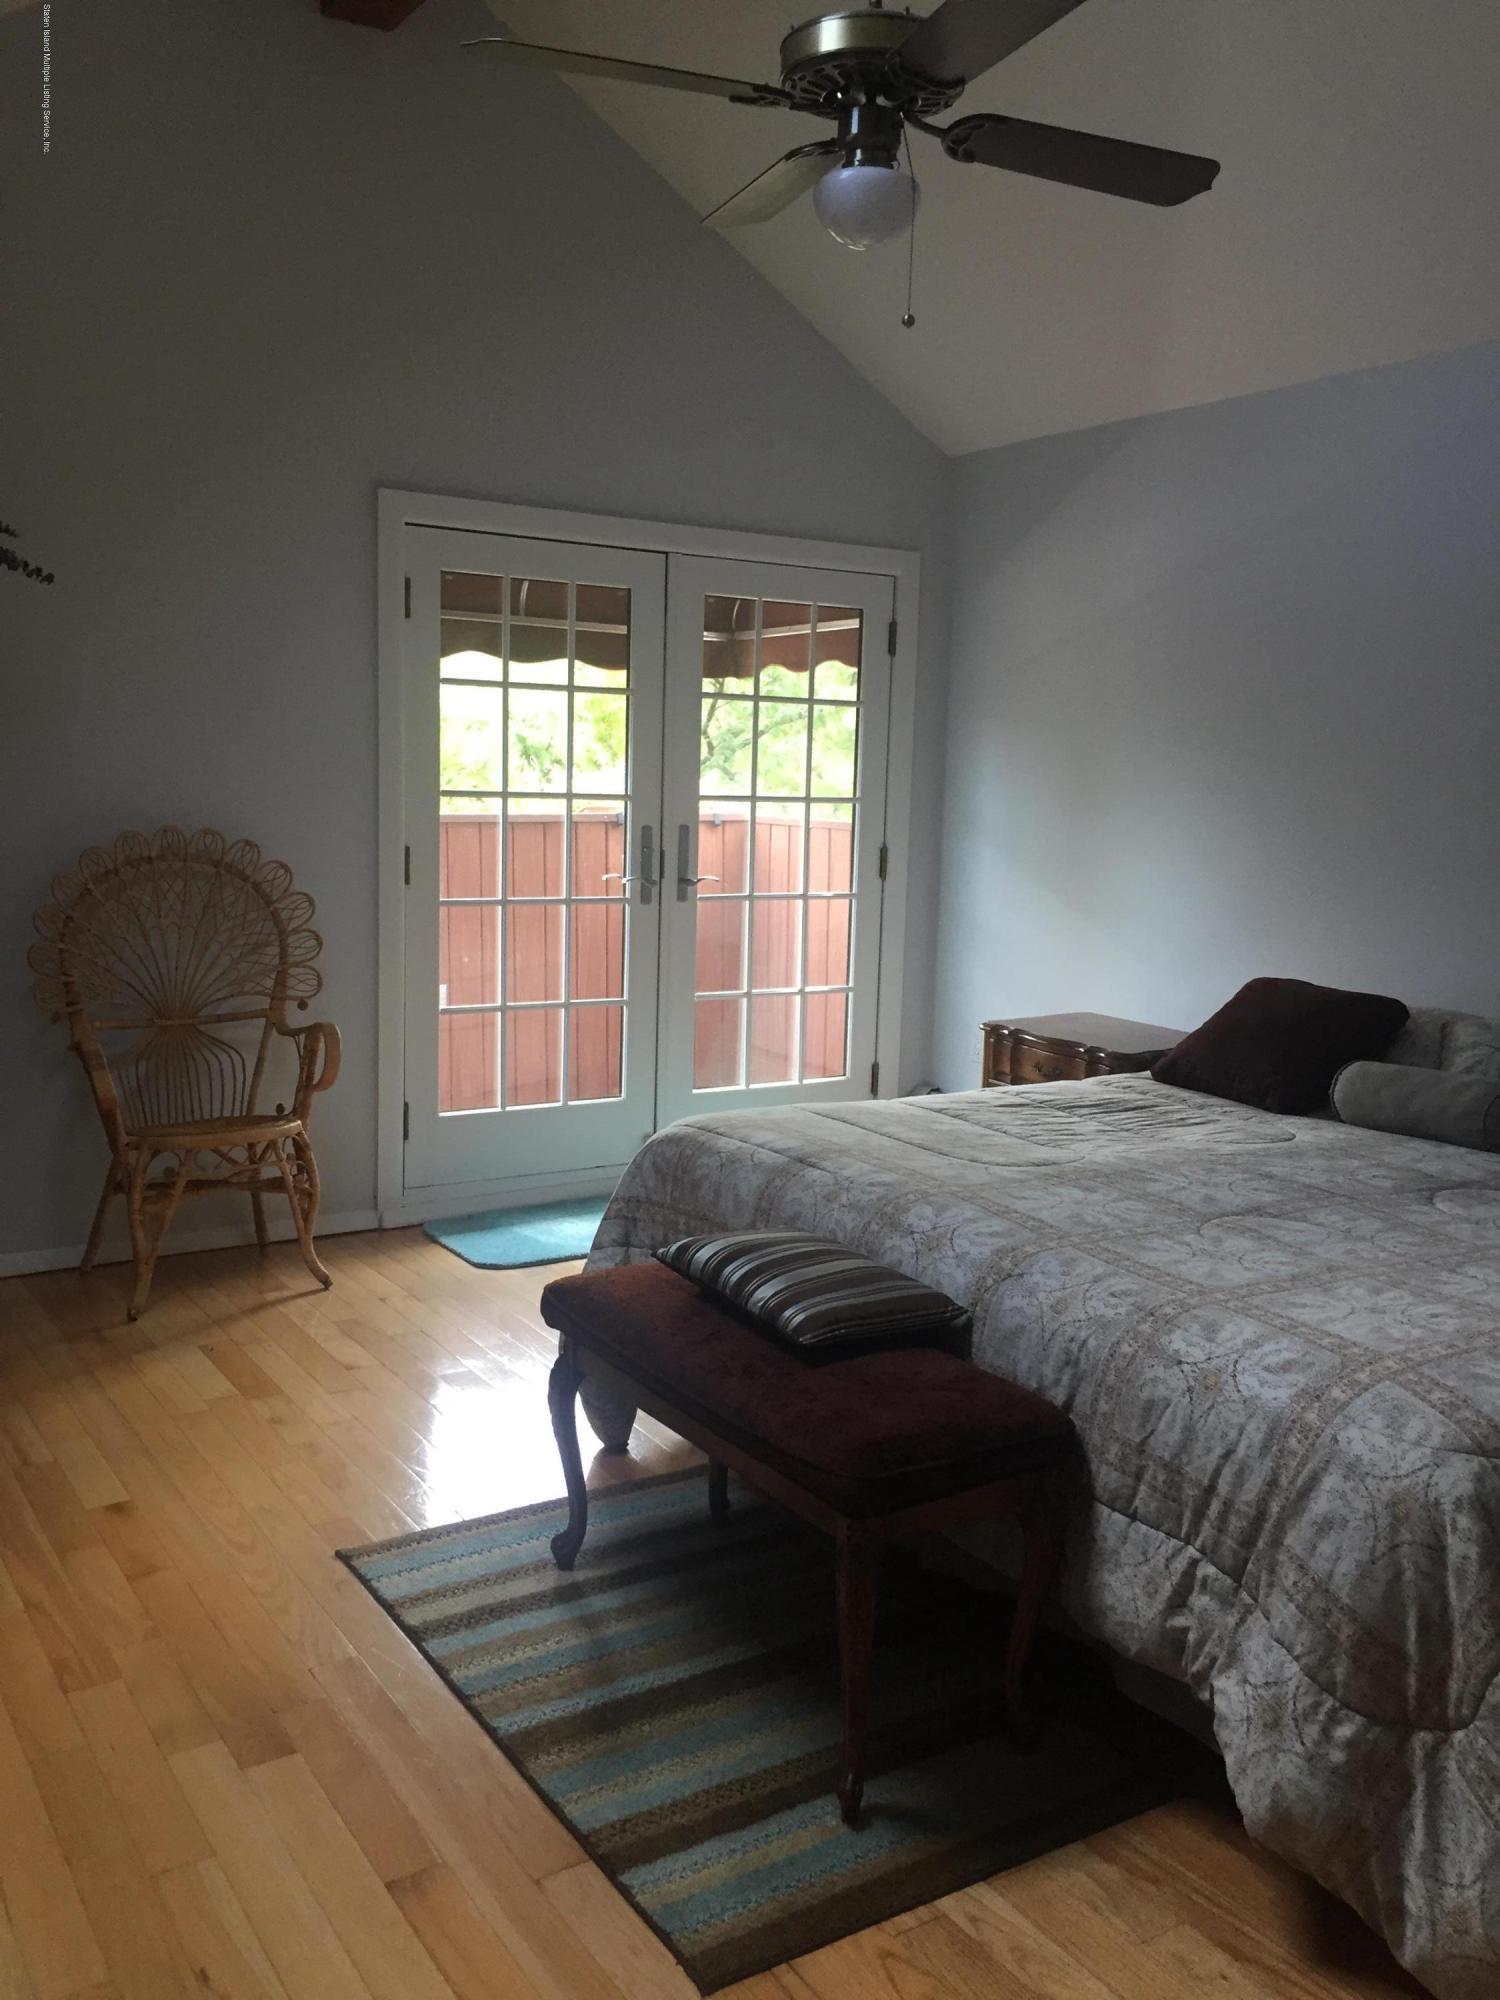 Single Family - Detached 46 Forrestal Avenue  Staten Island, NY 10312, MLS-1131922-25